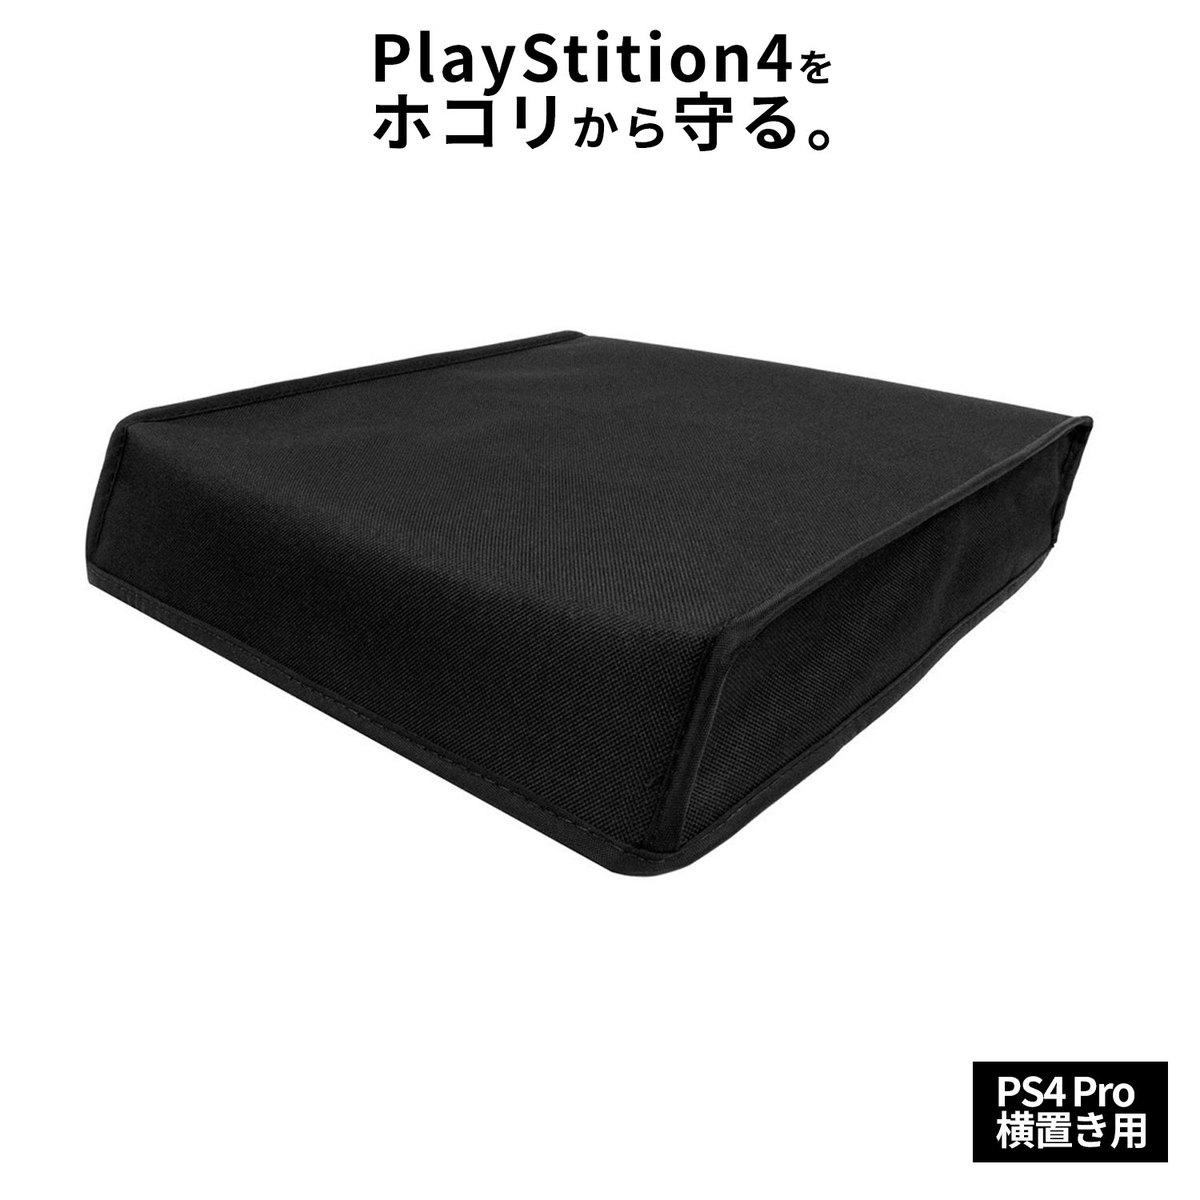 PS4 Pro専用 横置き プレミアムナイロンダストカバー ホコリ カバー 防水加工